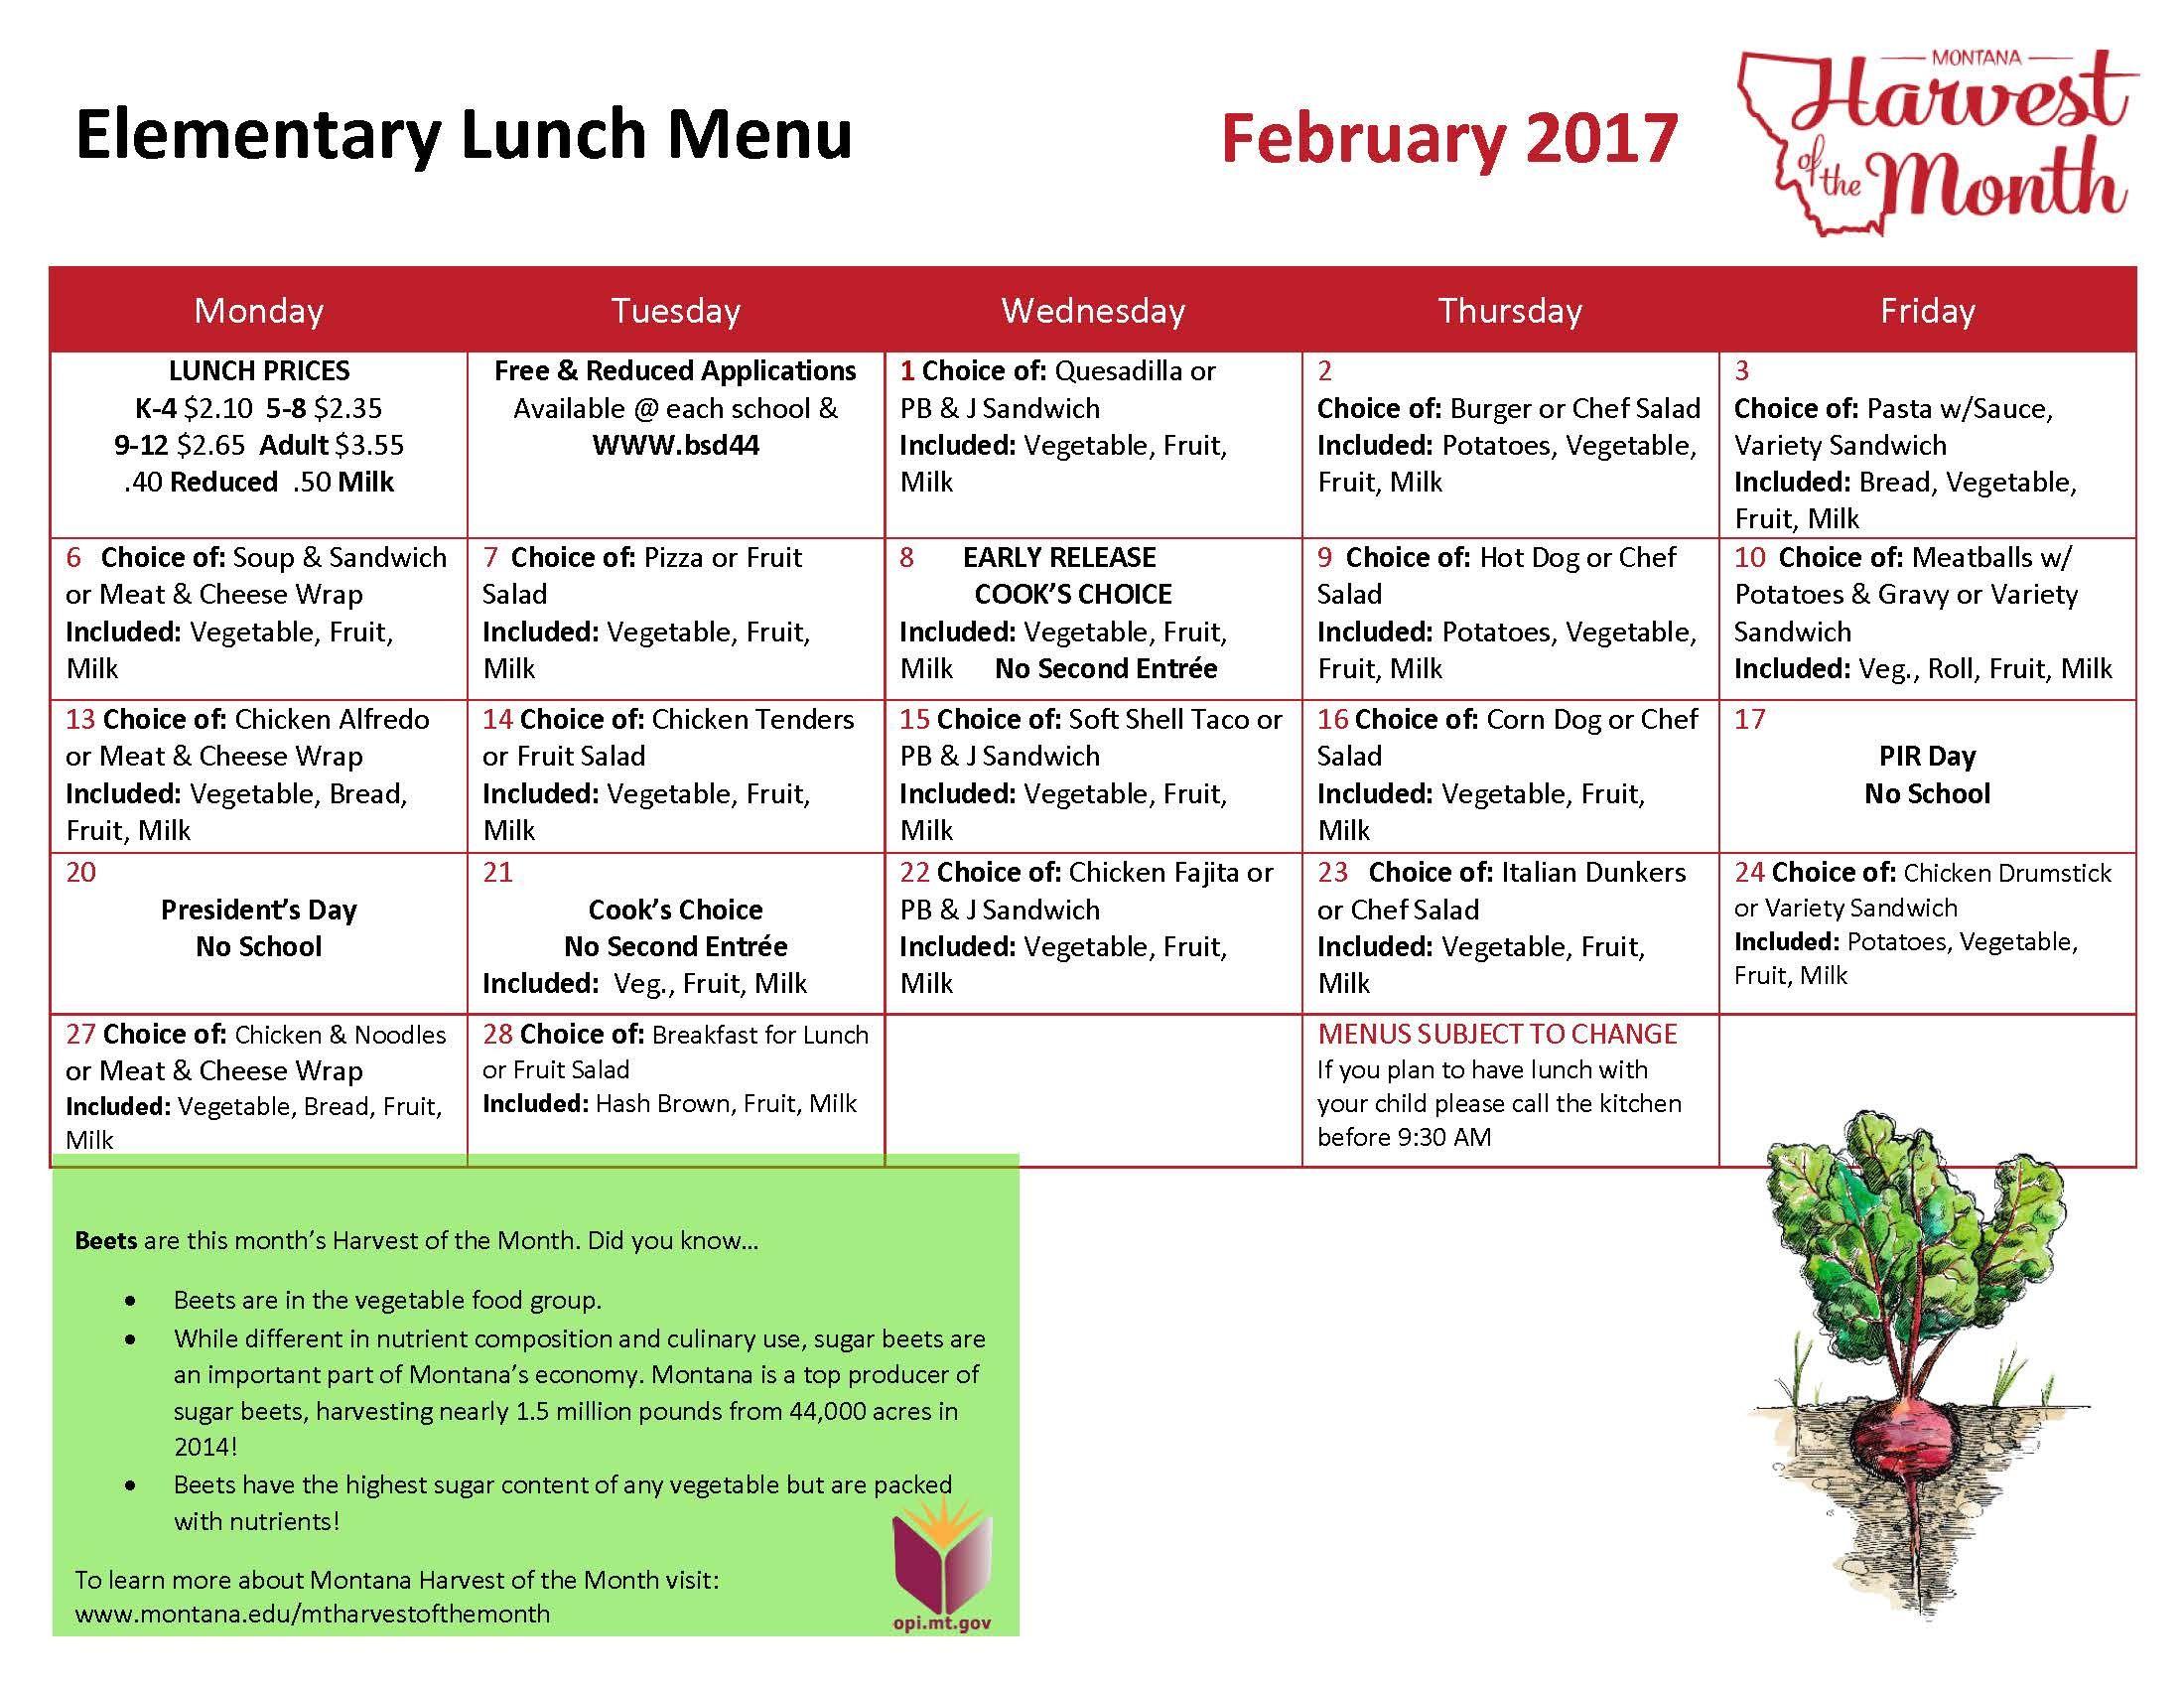 February 2017 Elementary Lunch Menu